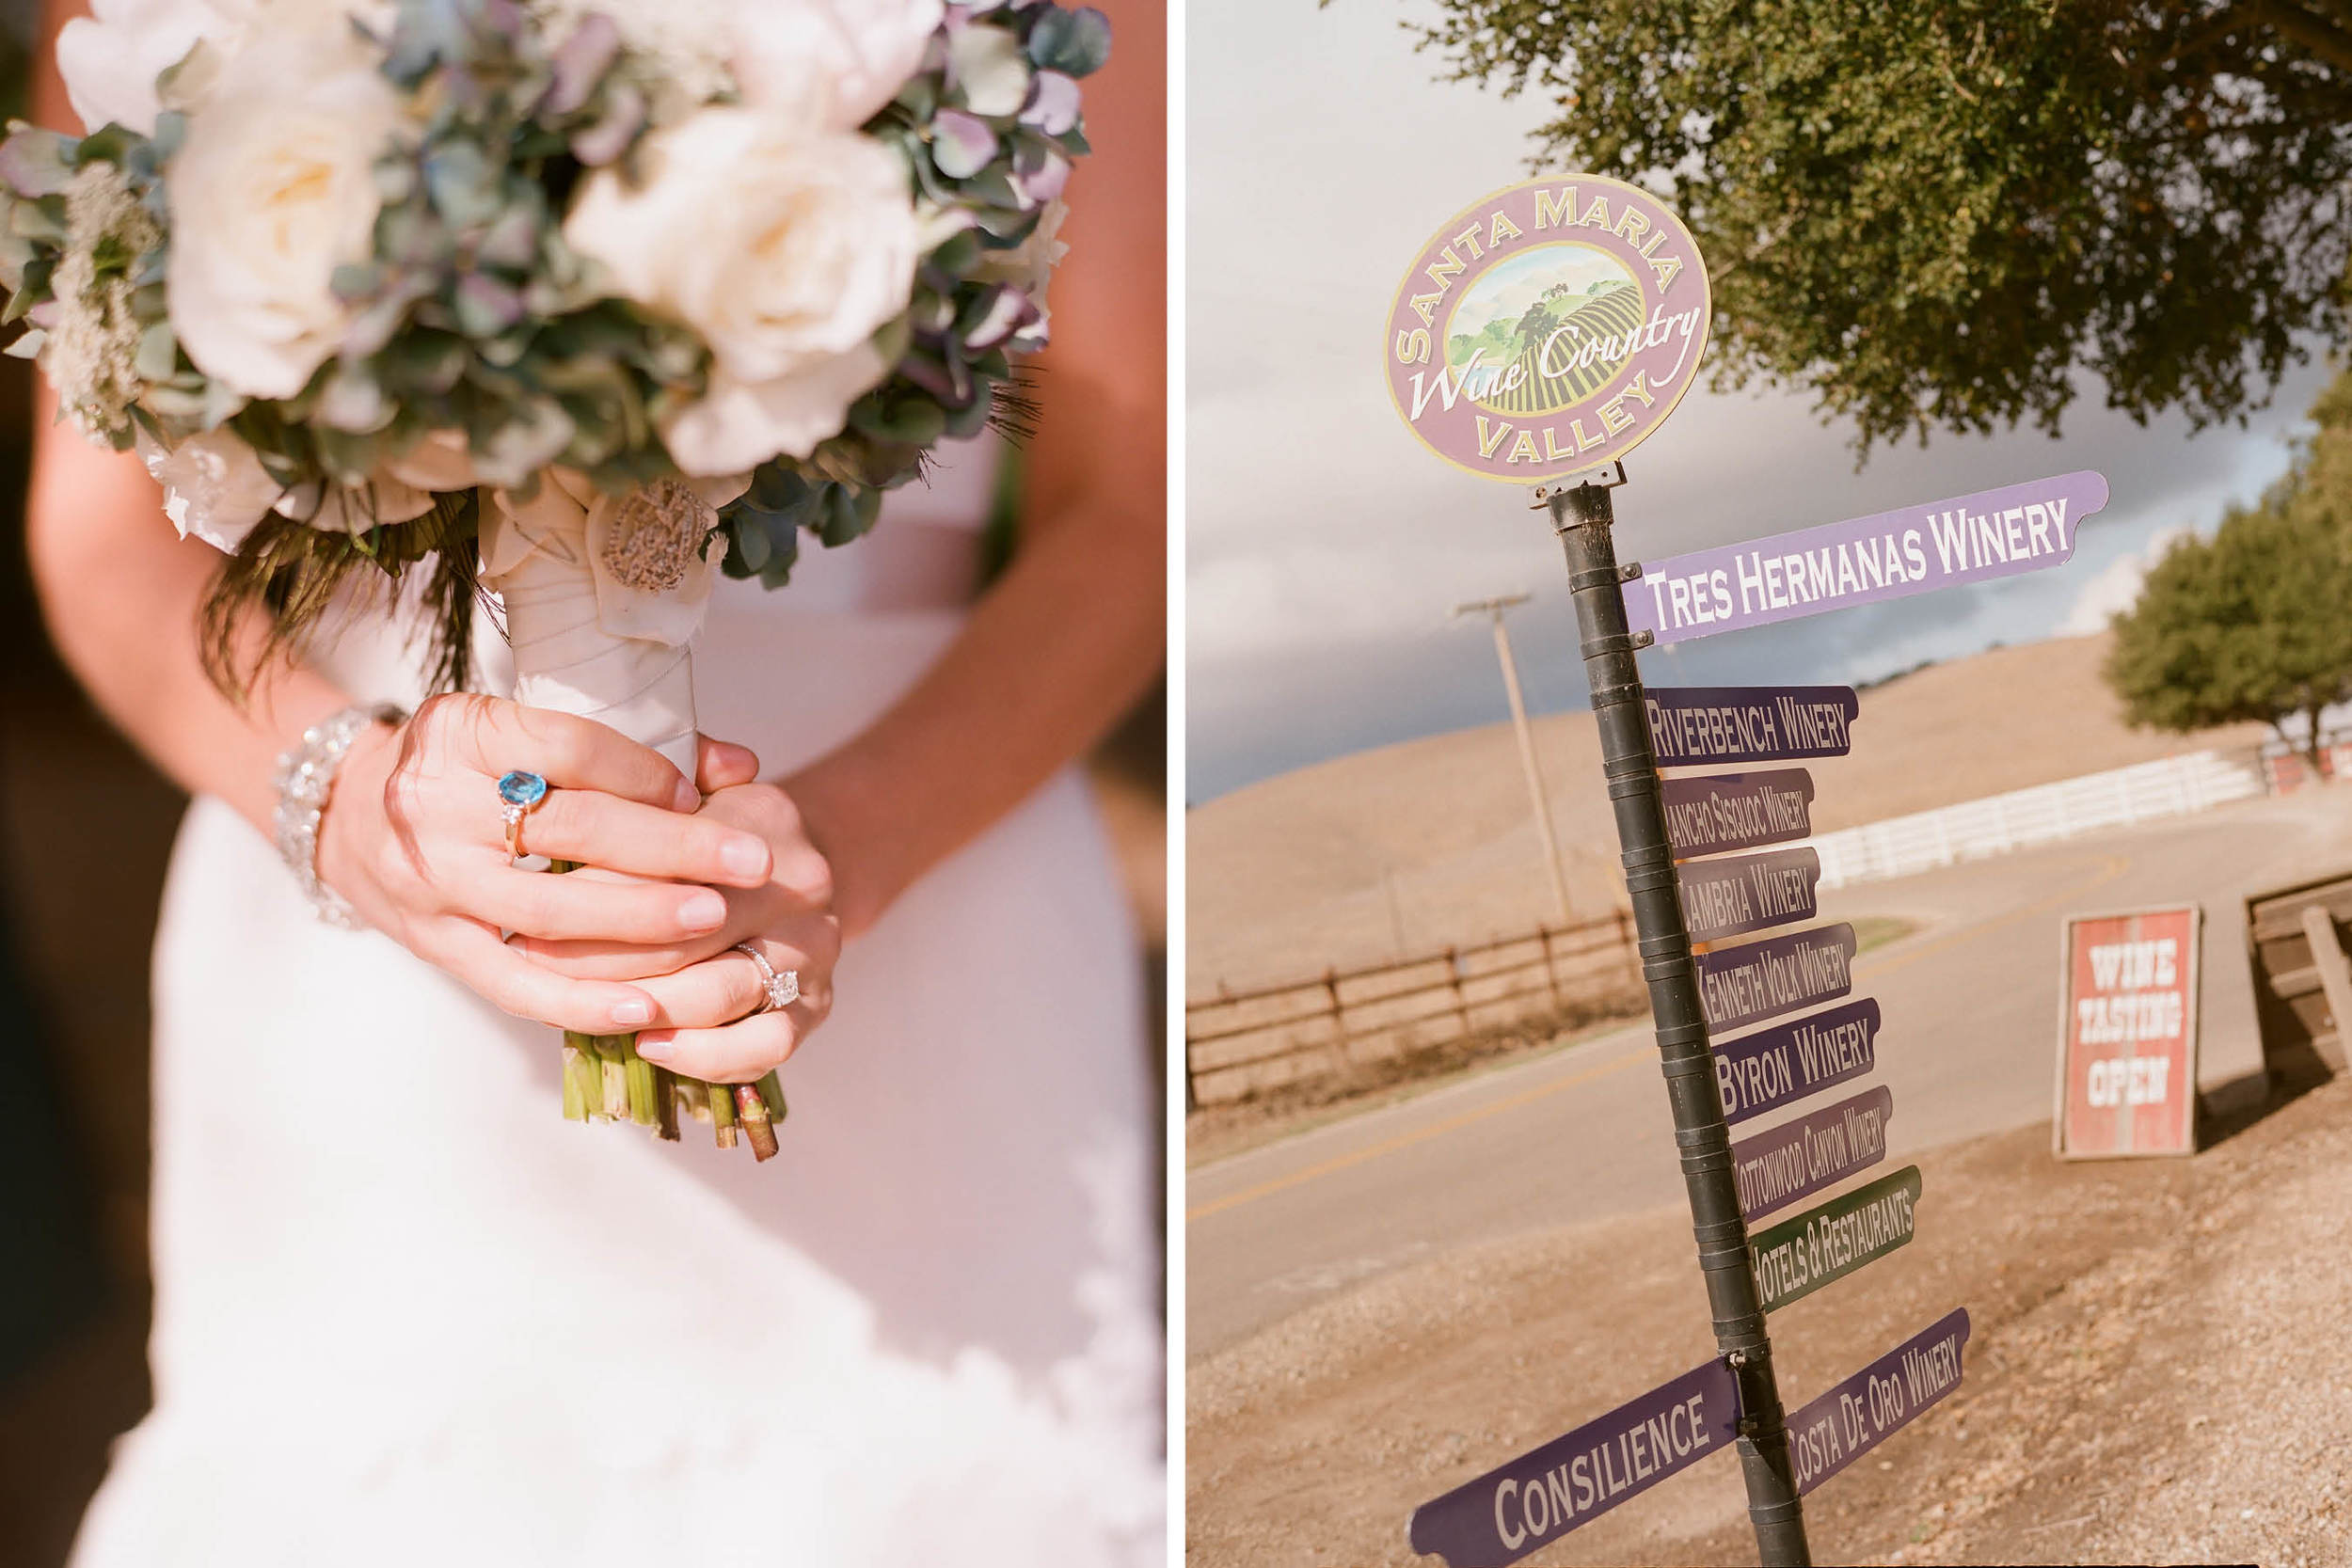 tres-hermanas-winery-vineyard-wedding-planner-coordinator-santa-barbara-ynez-maria (3).jpg